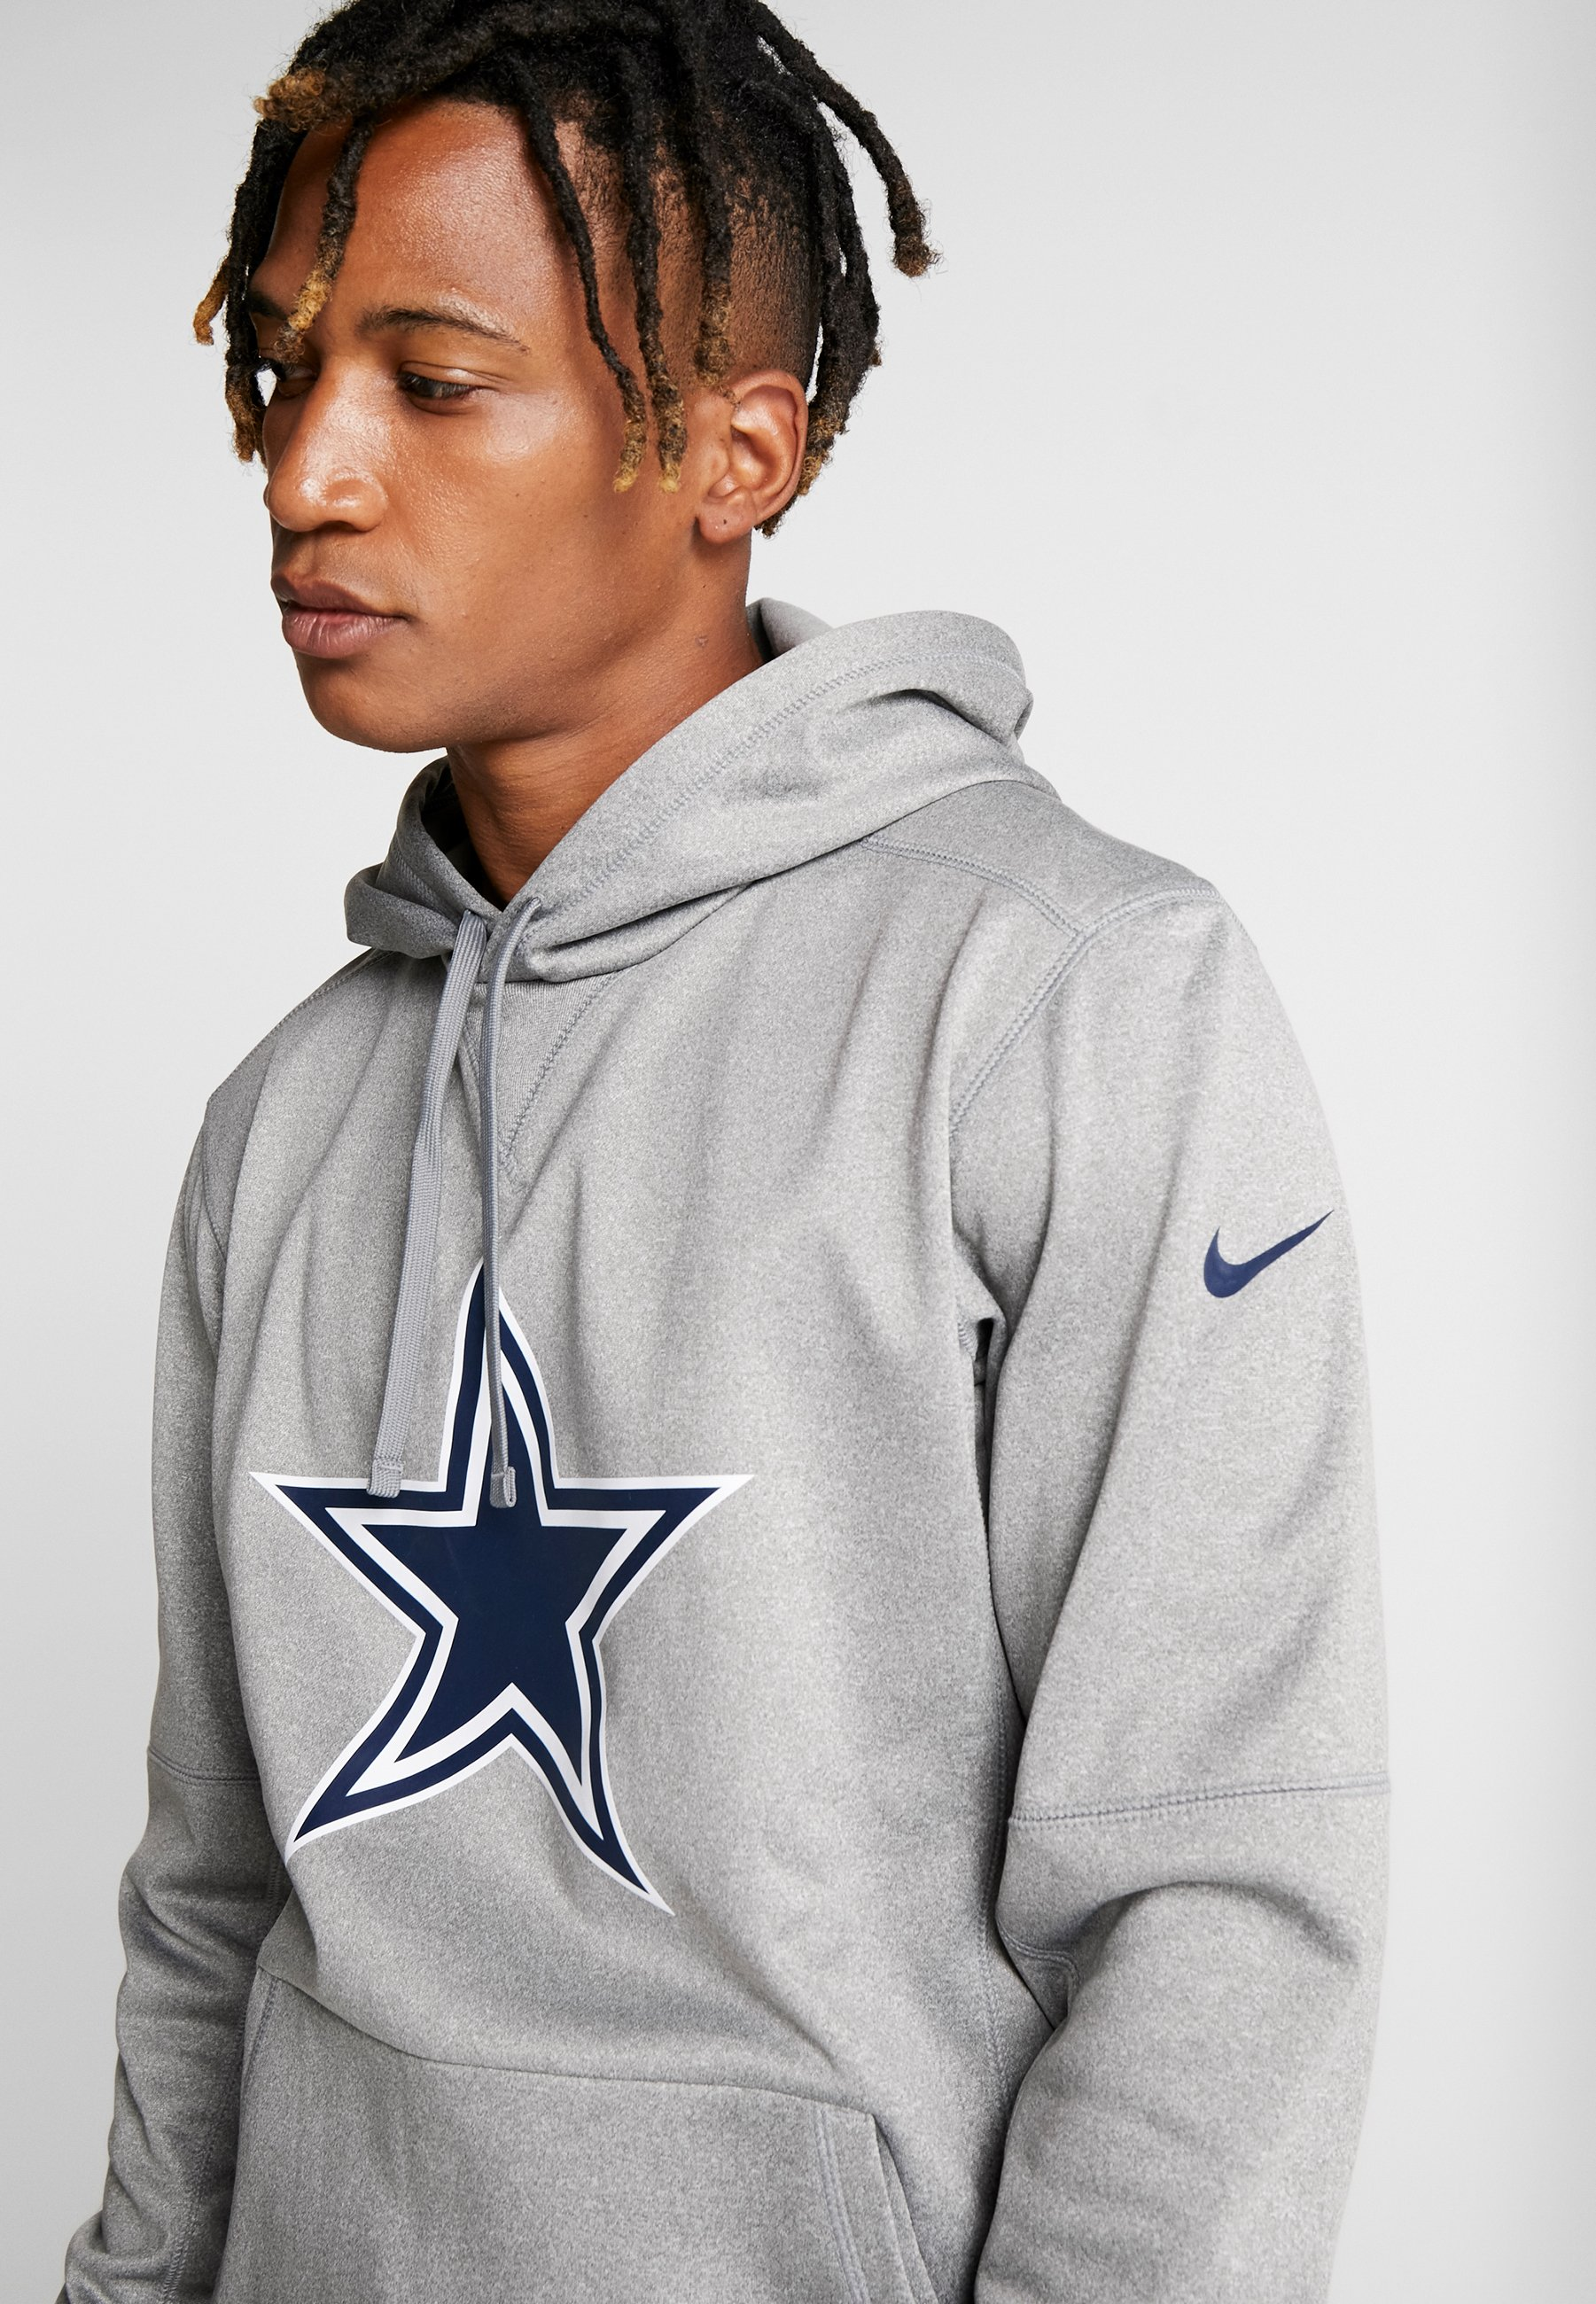 Grey Heather Navy college Dallas Nike Essential Logo HoodieFelpa Nfl Con Cowboys Performance Dark Cappuccio KJl1FuT3c